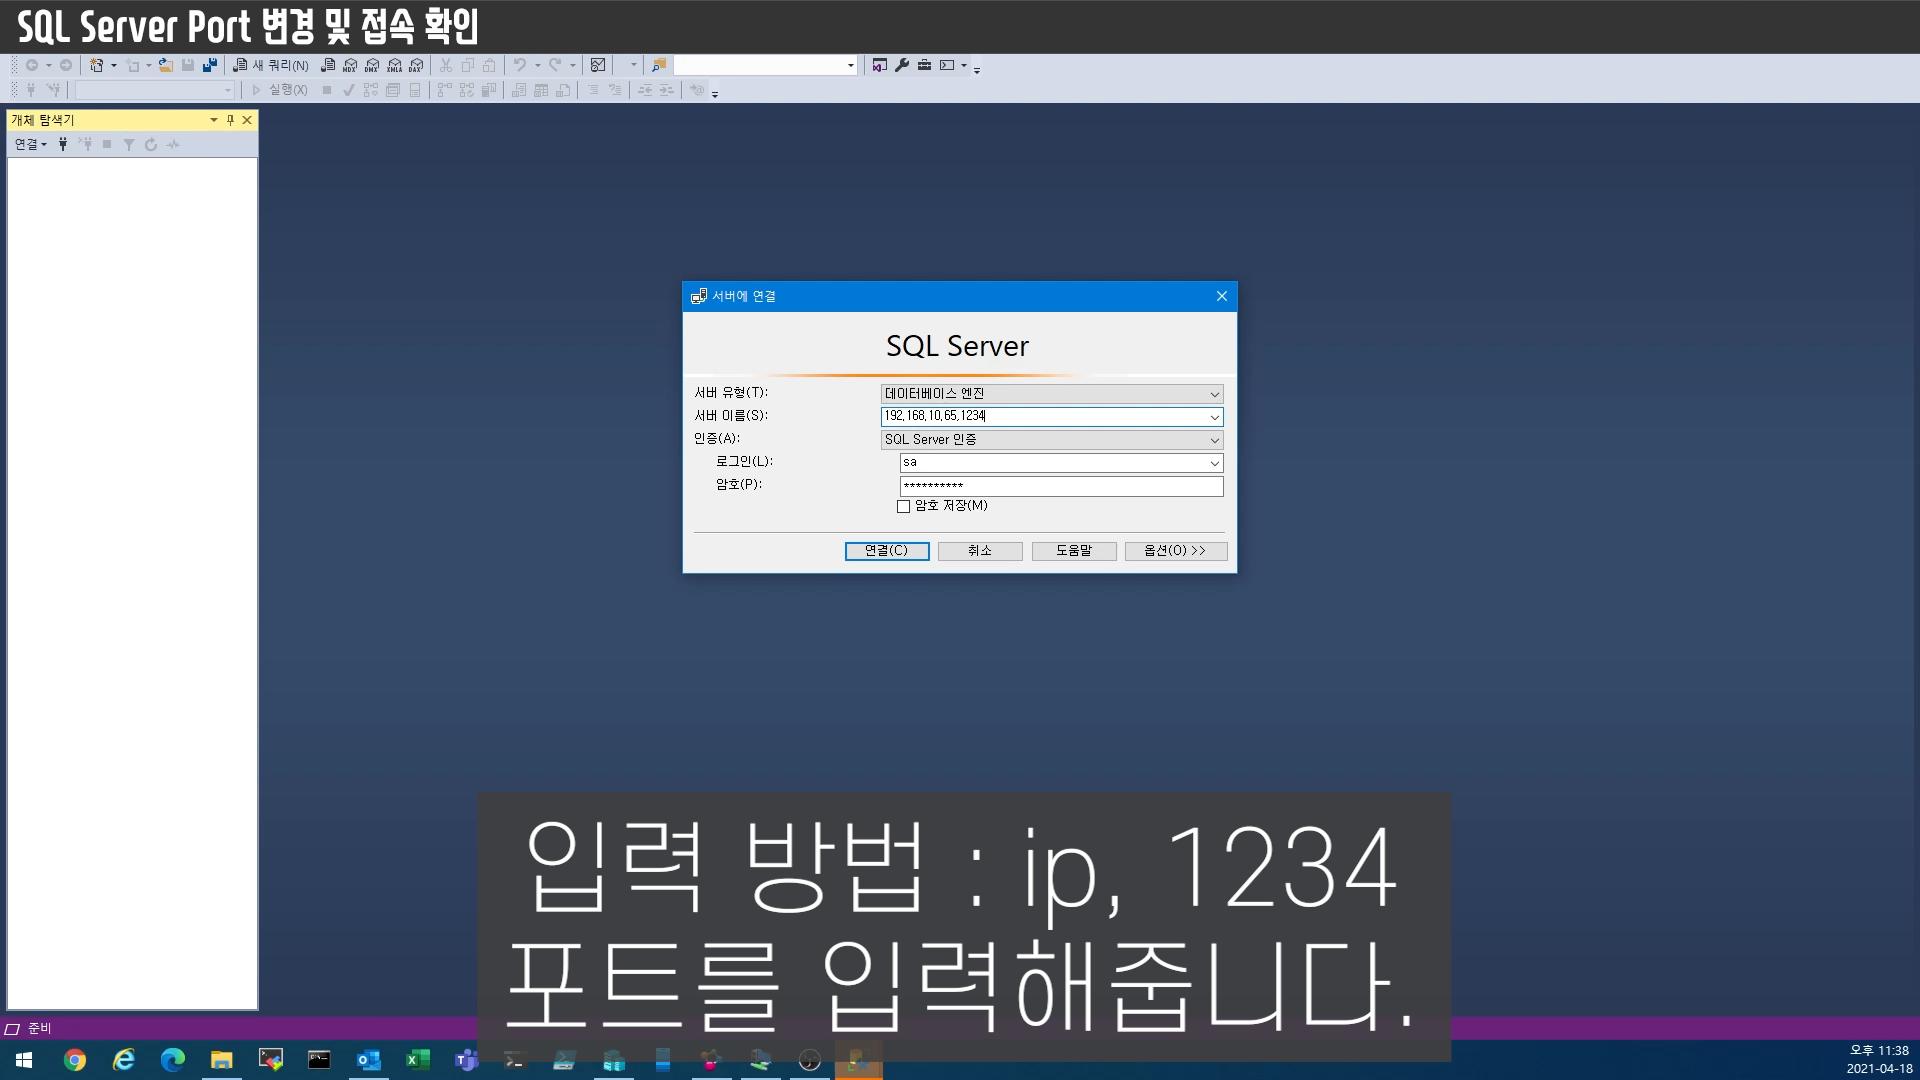 SQL Server 포트 변경.00_04_13_08.스틸 005.png